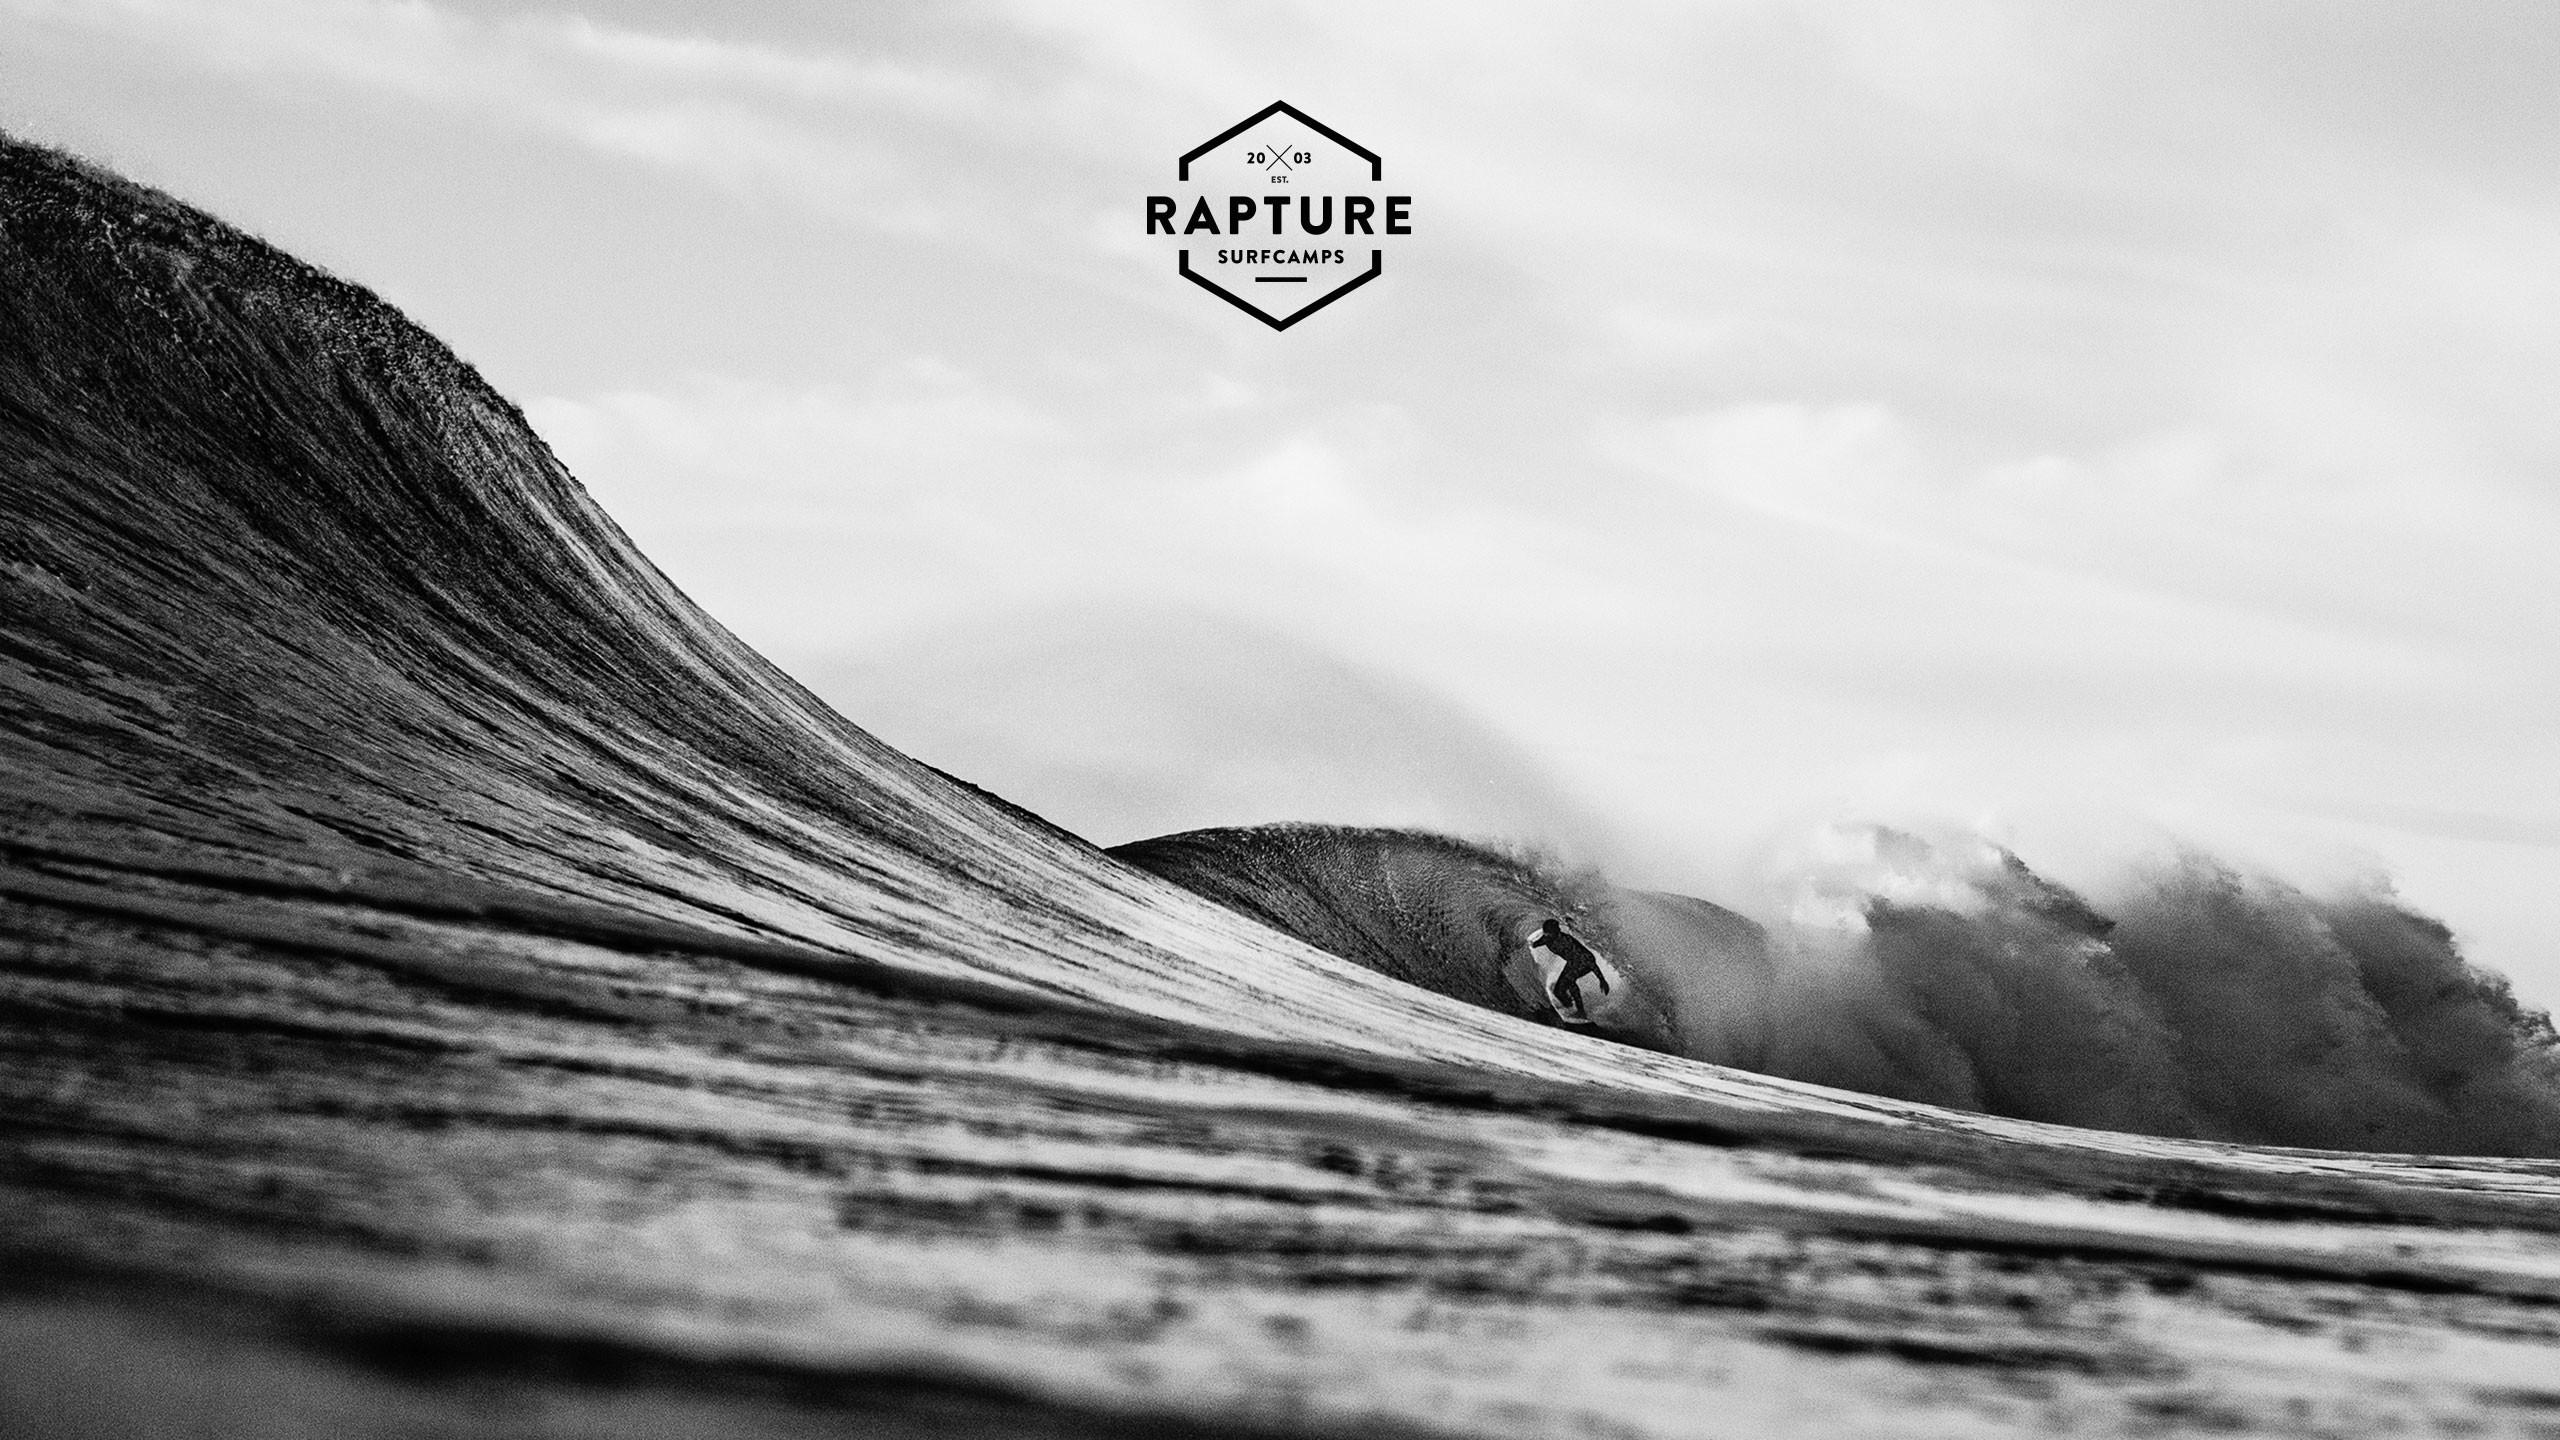 Surf High Quality Wallpaper #693960377